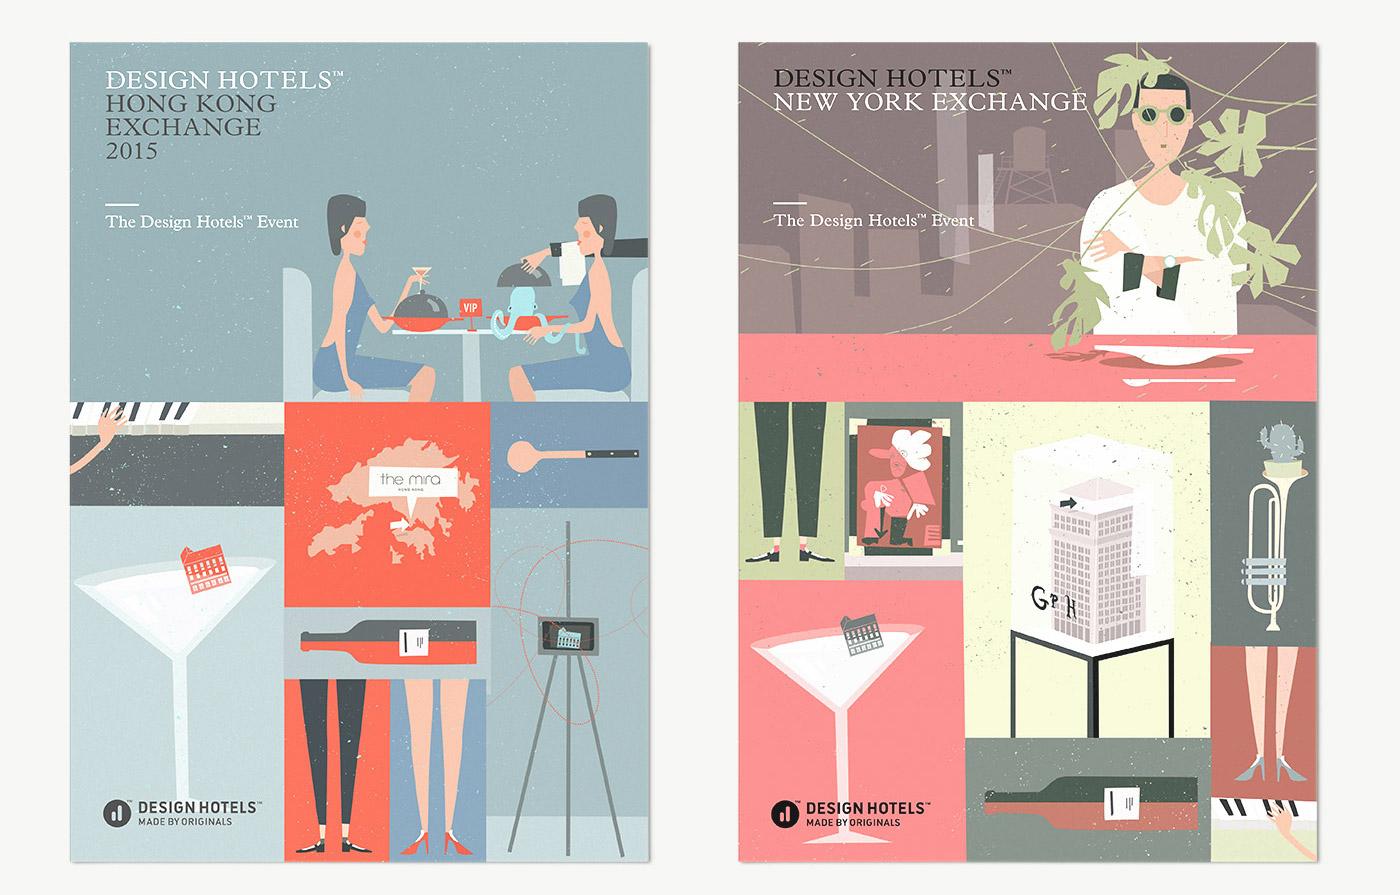 designhotels-community-illus-part4a